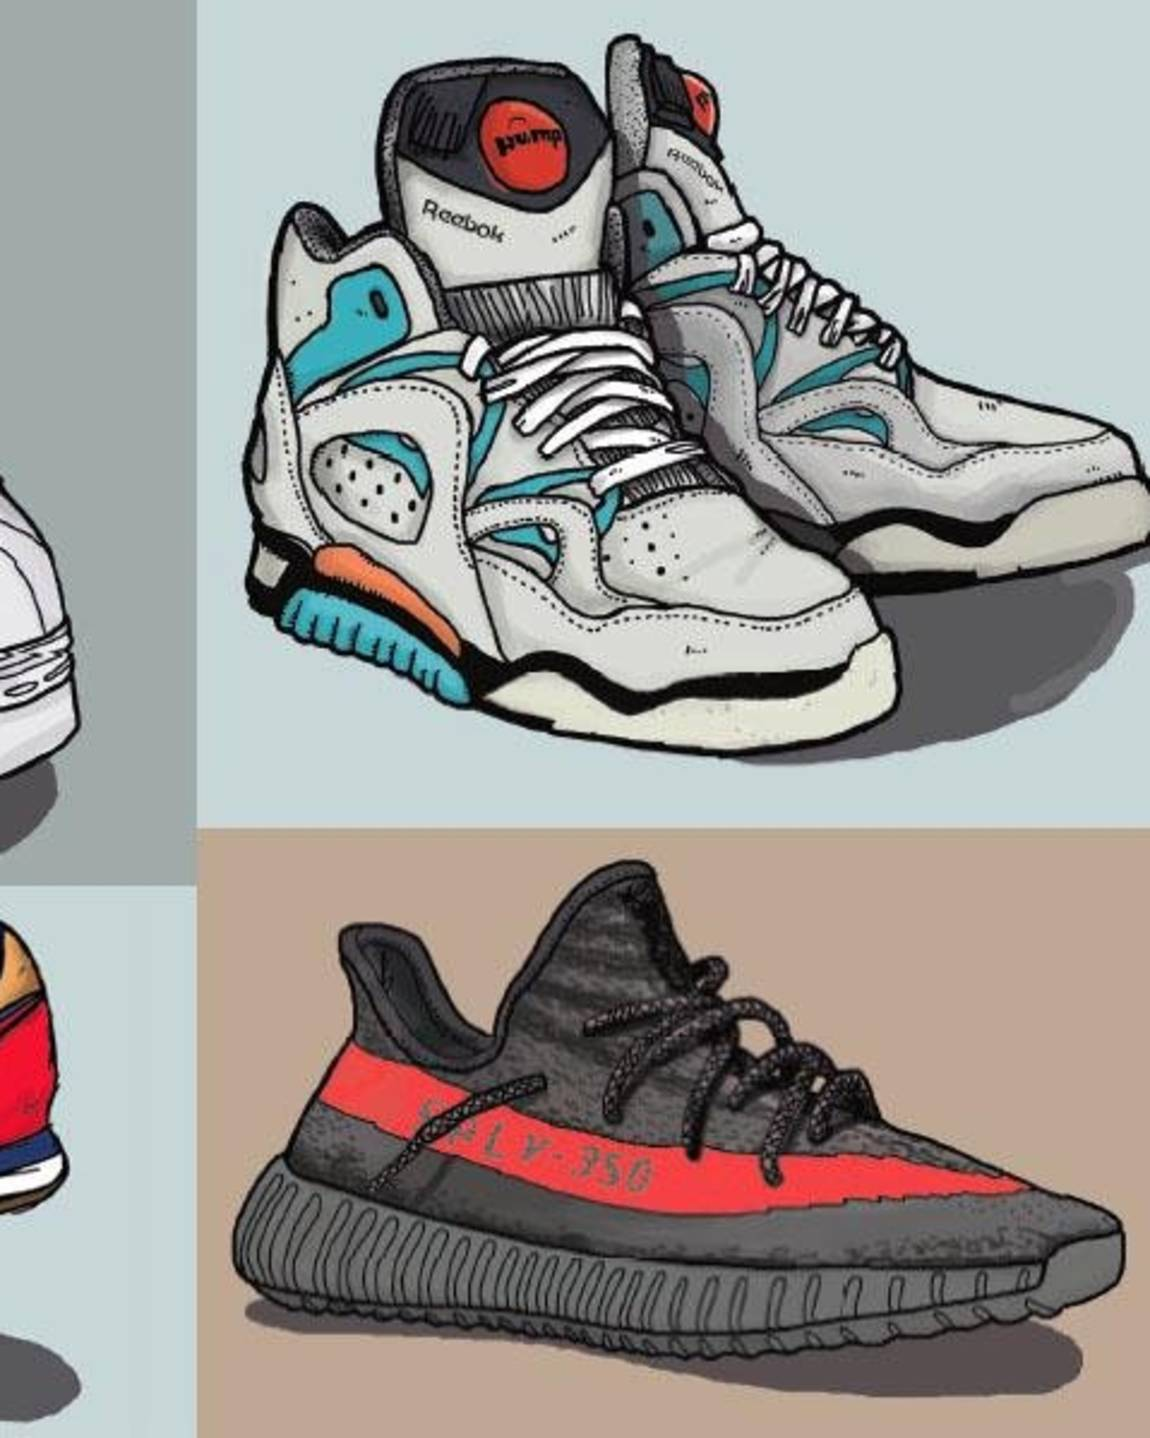 Sneaker ABC: Alles, was du über Sneakers wissen musst!